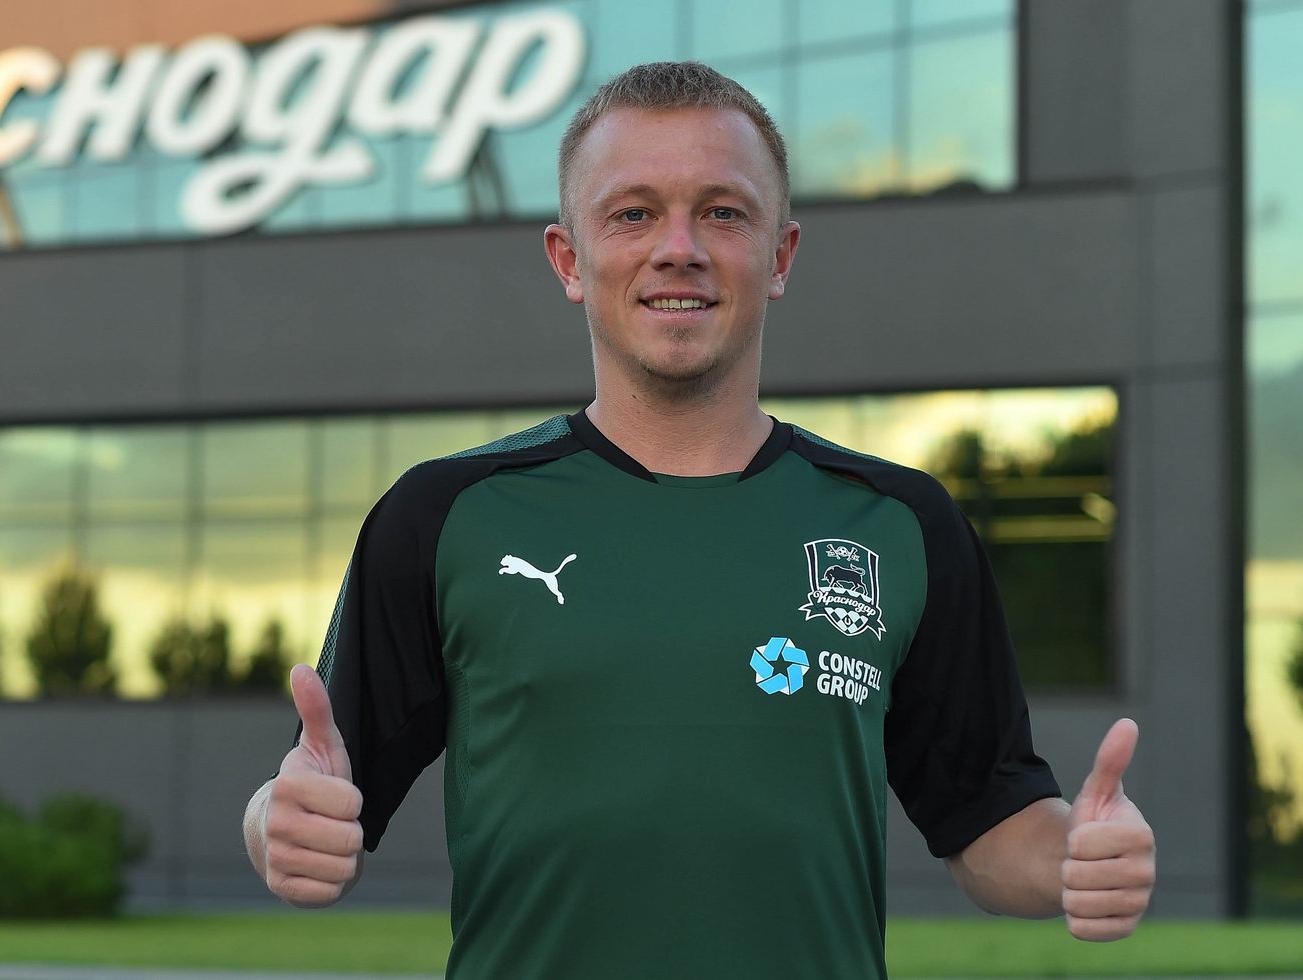 Ренат Янбаев перешел в «Краснодар»